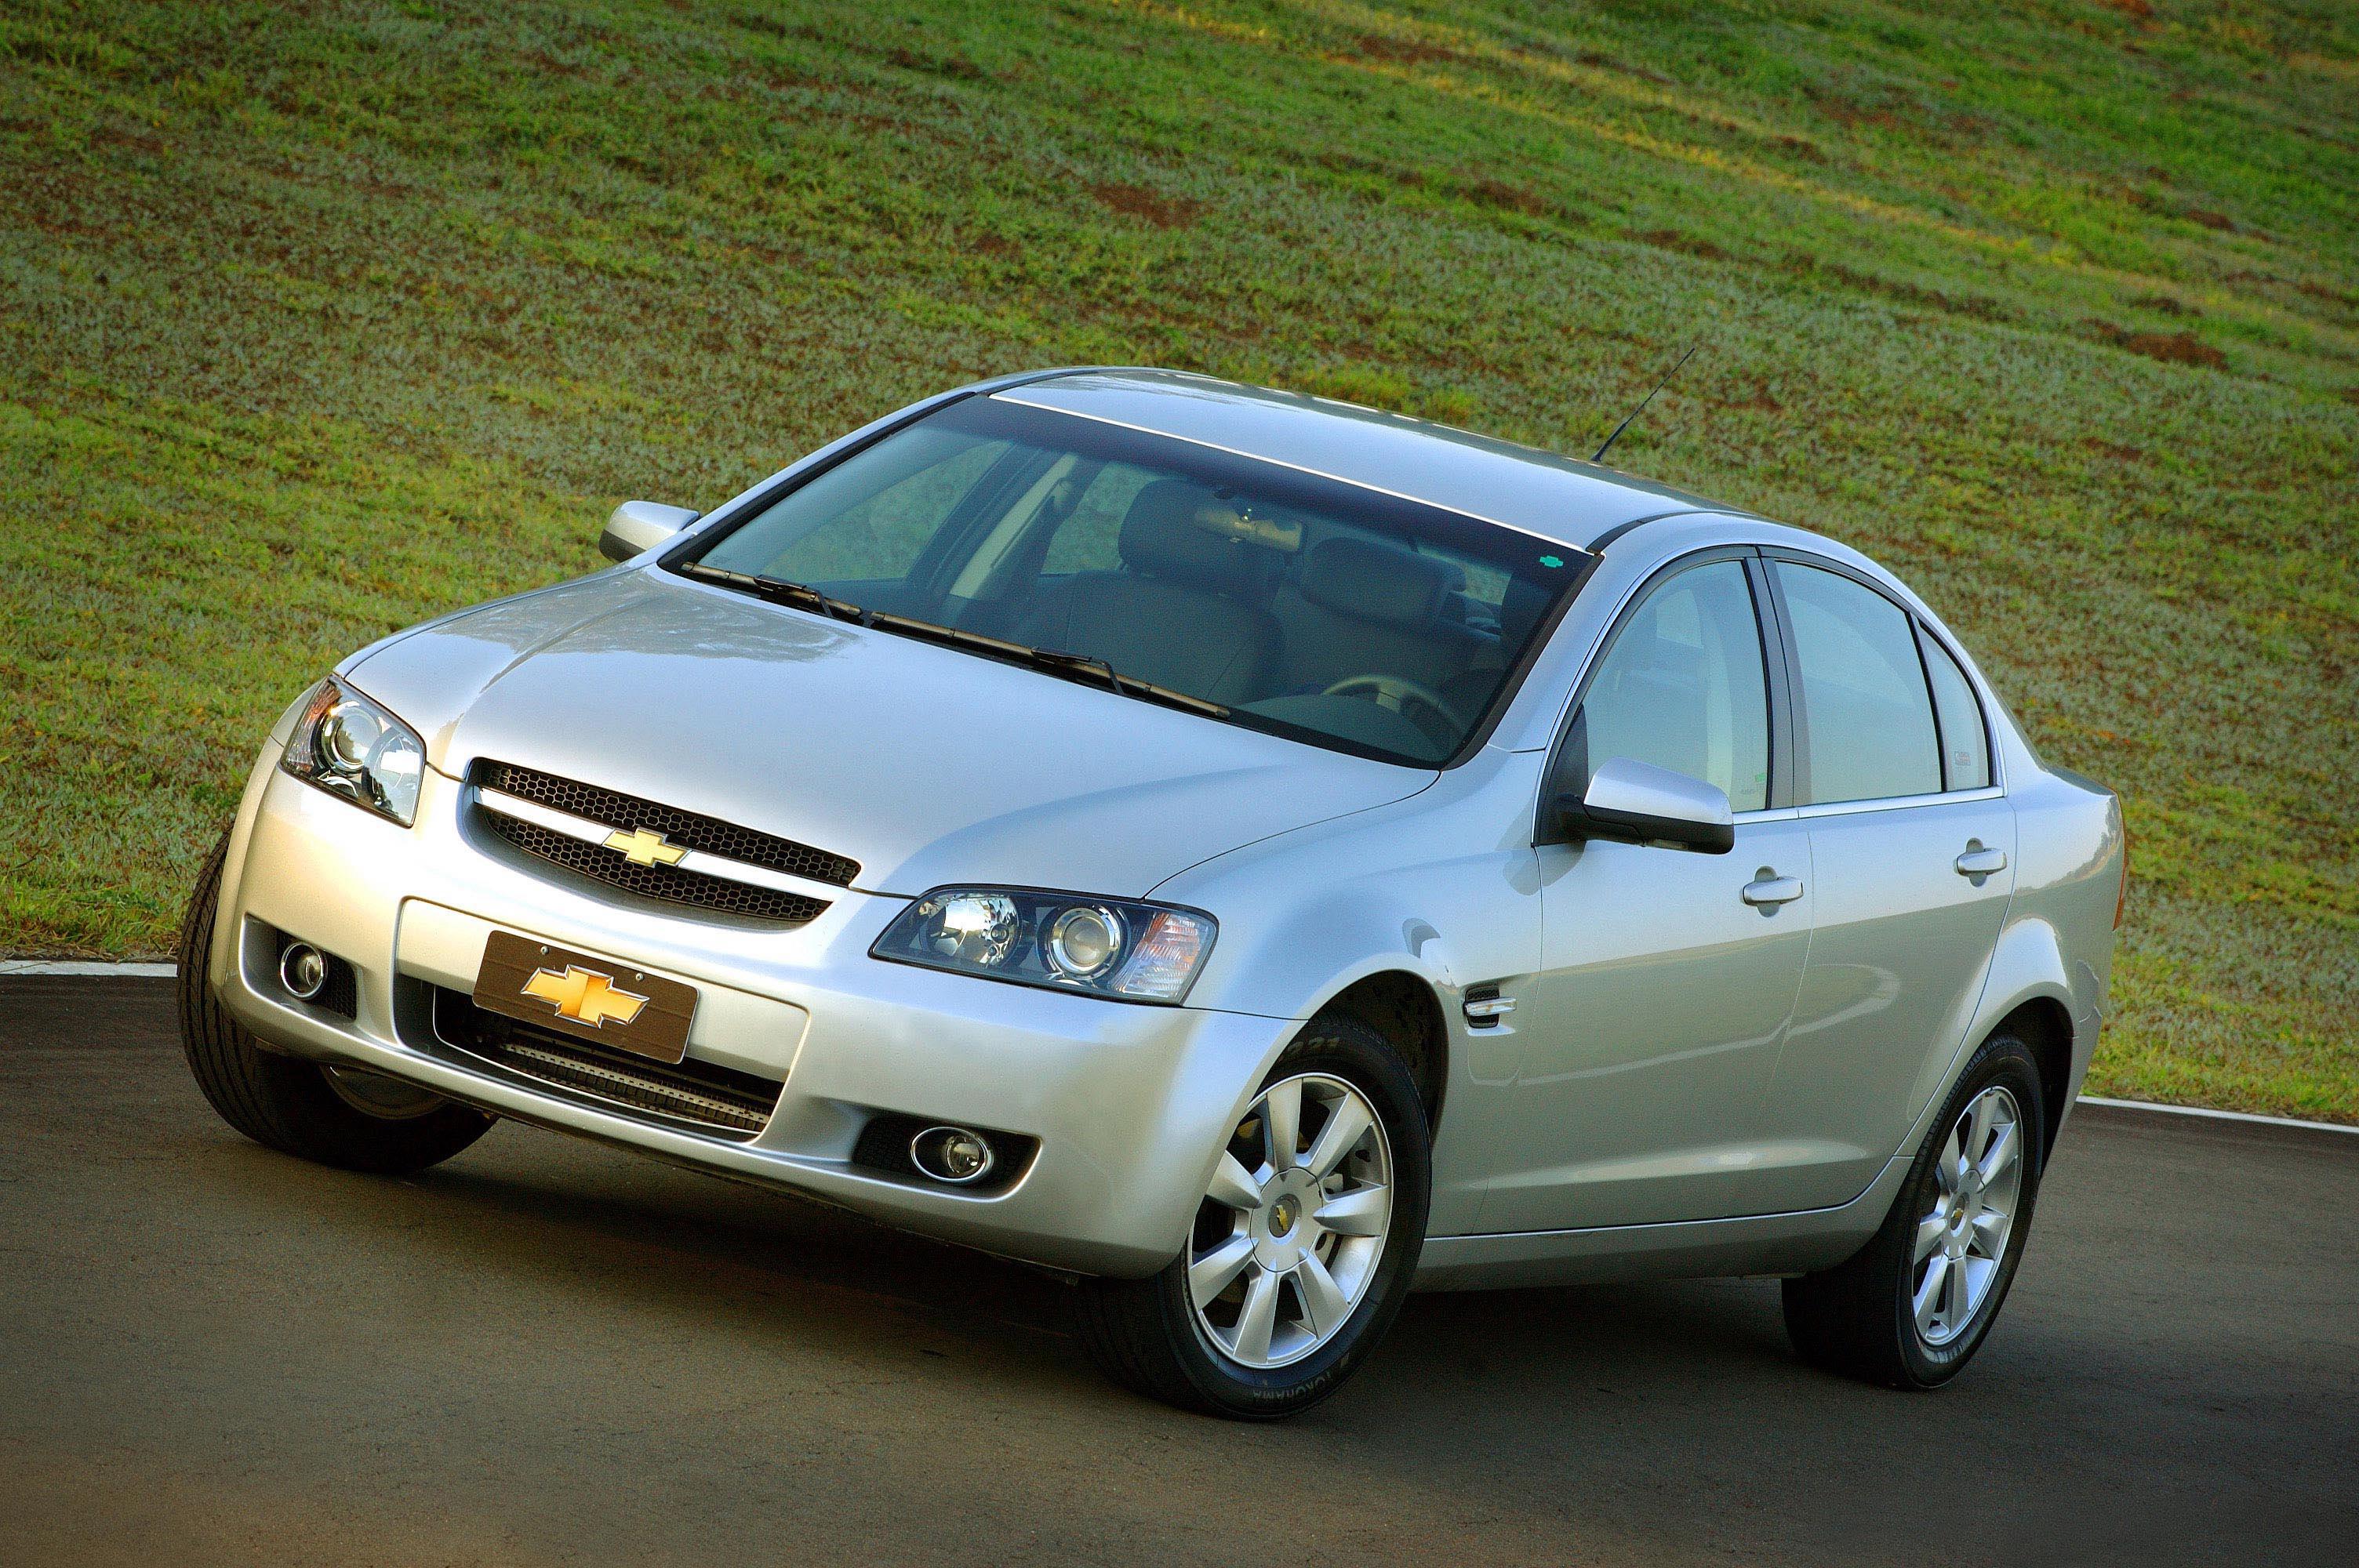 Chevrolet Omega 2009 foto - 2